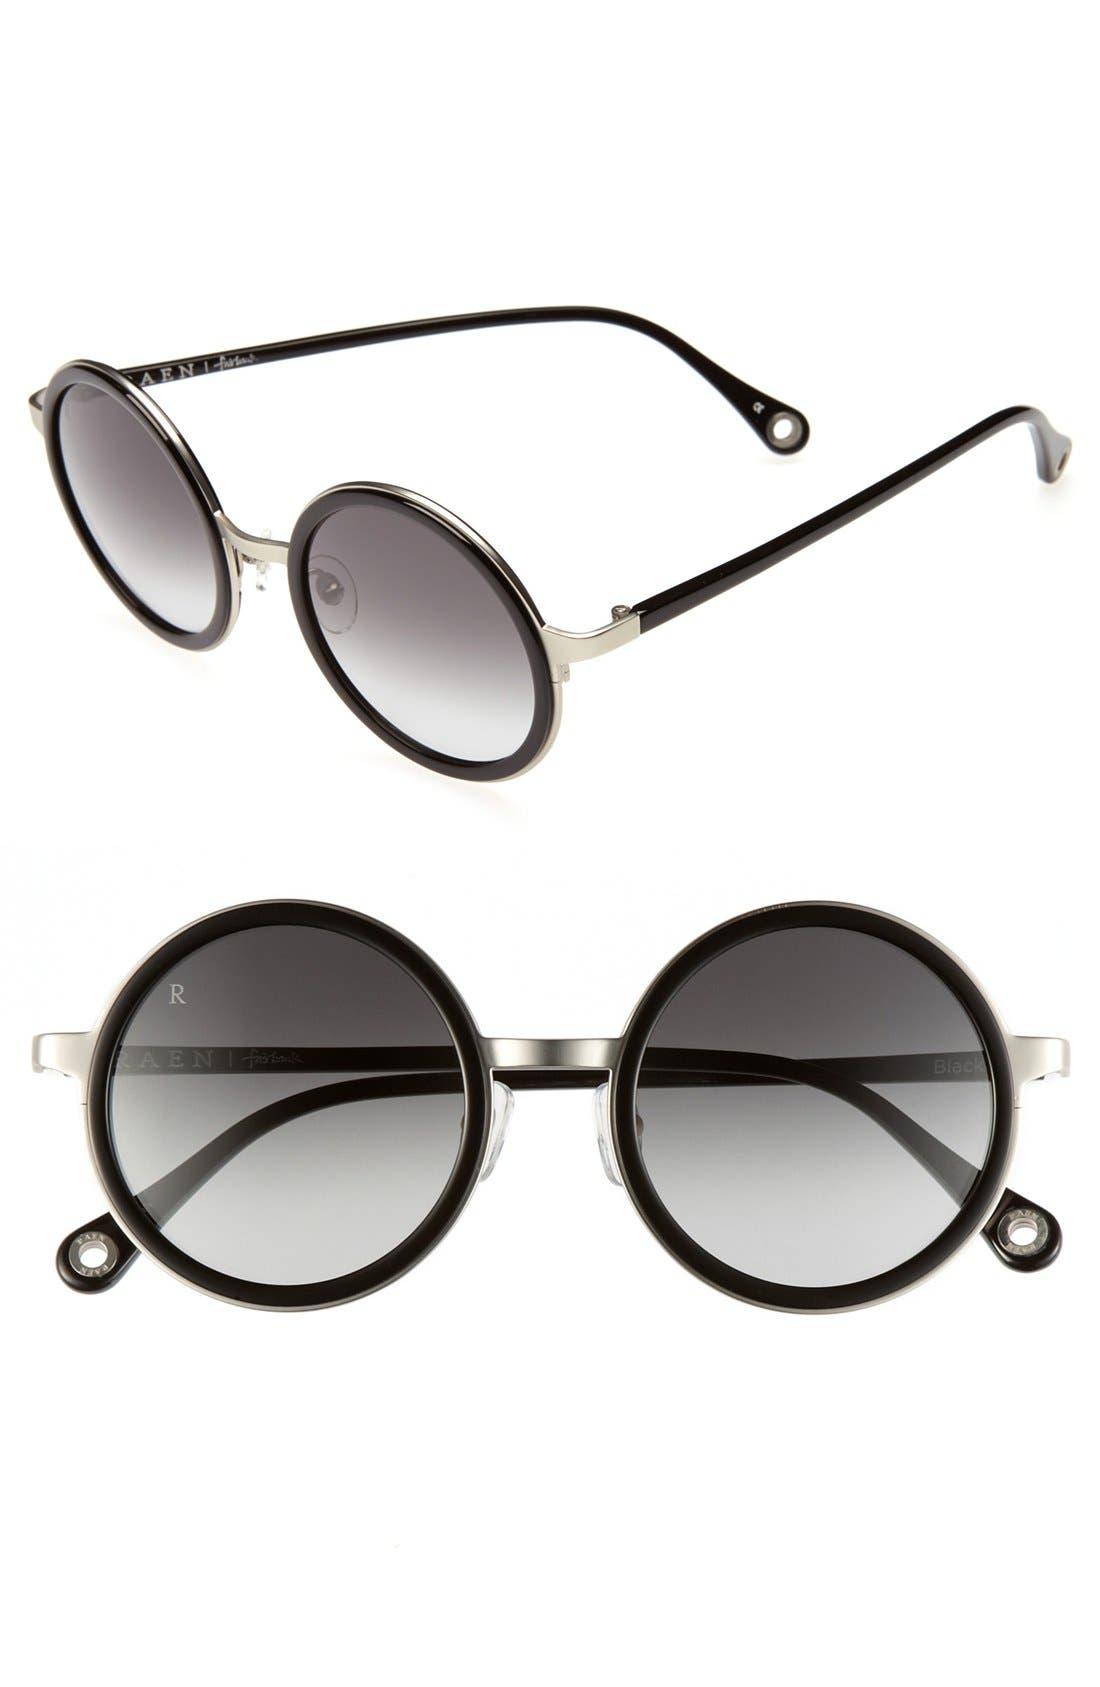 Main Image - RAEN 'Fairbank' 54mm Sunglasses